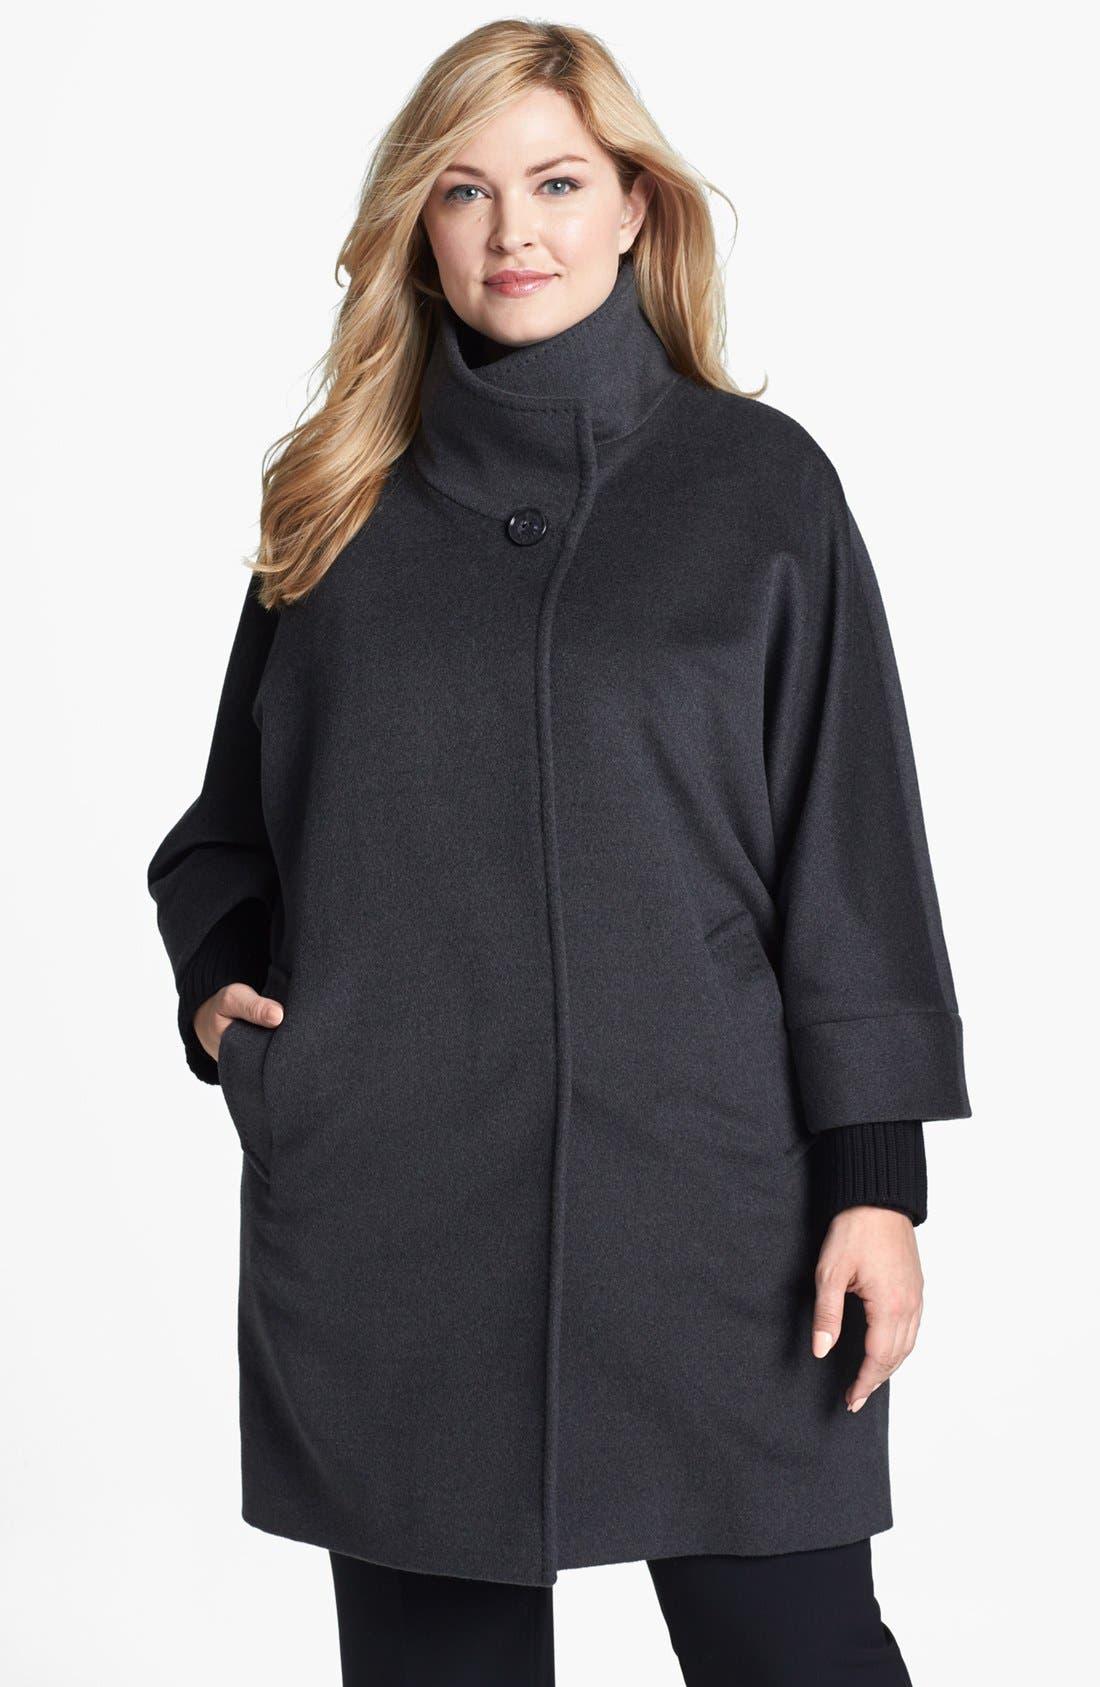 Alternate Image 1 Selected - Cinzia Rocca Knit Cuff Wool Car Coat (Plus Size)